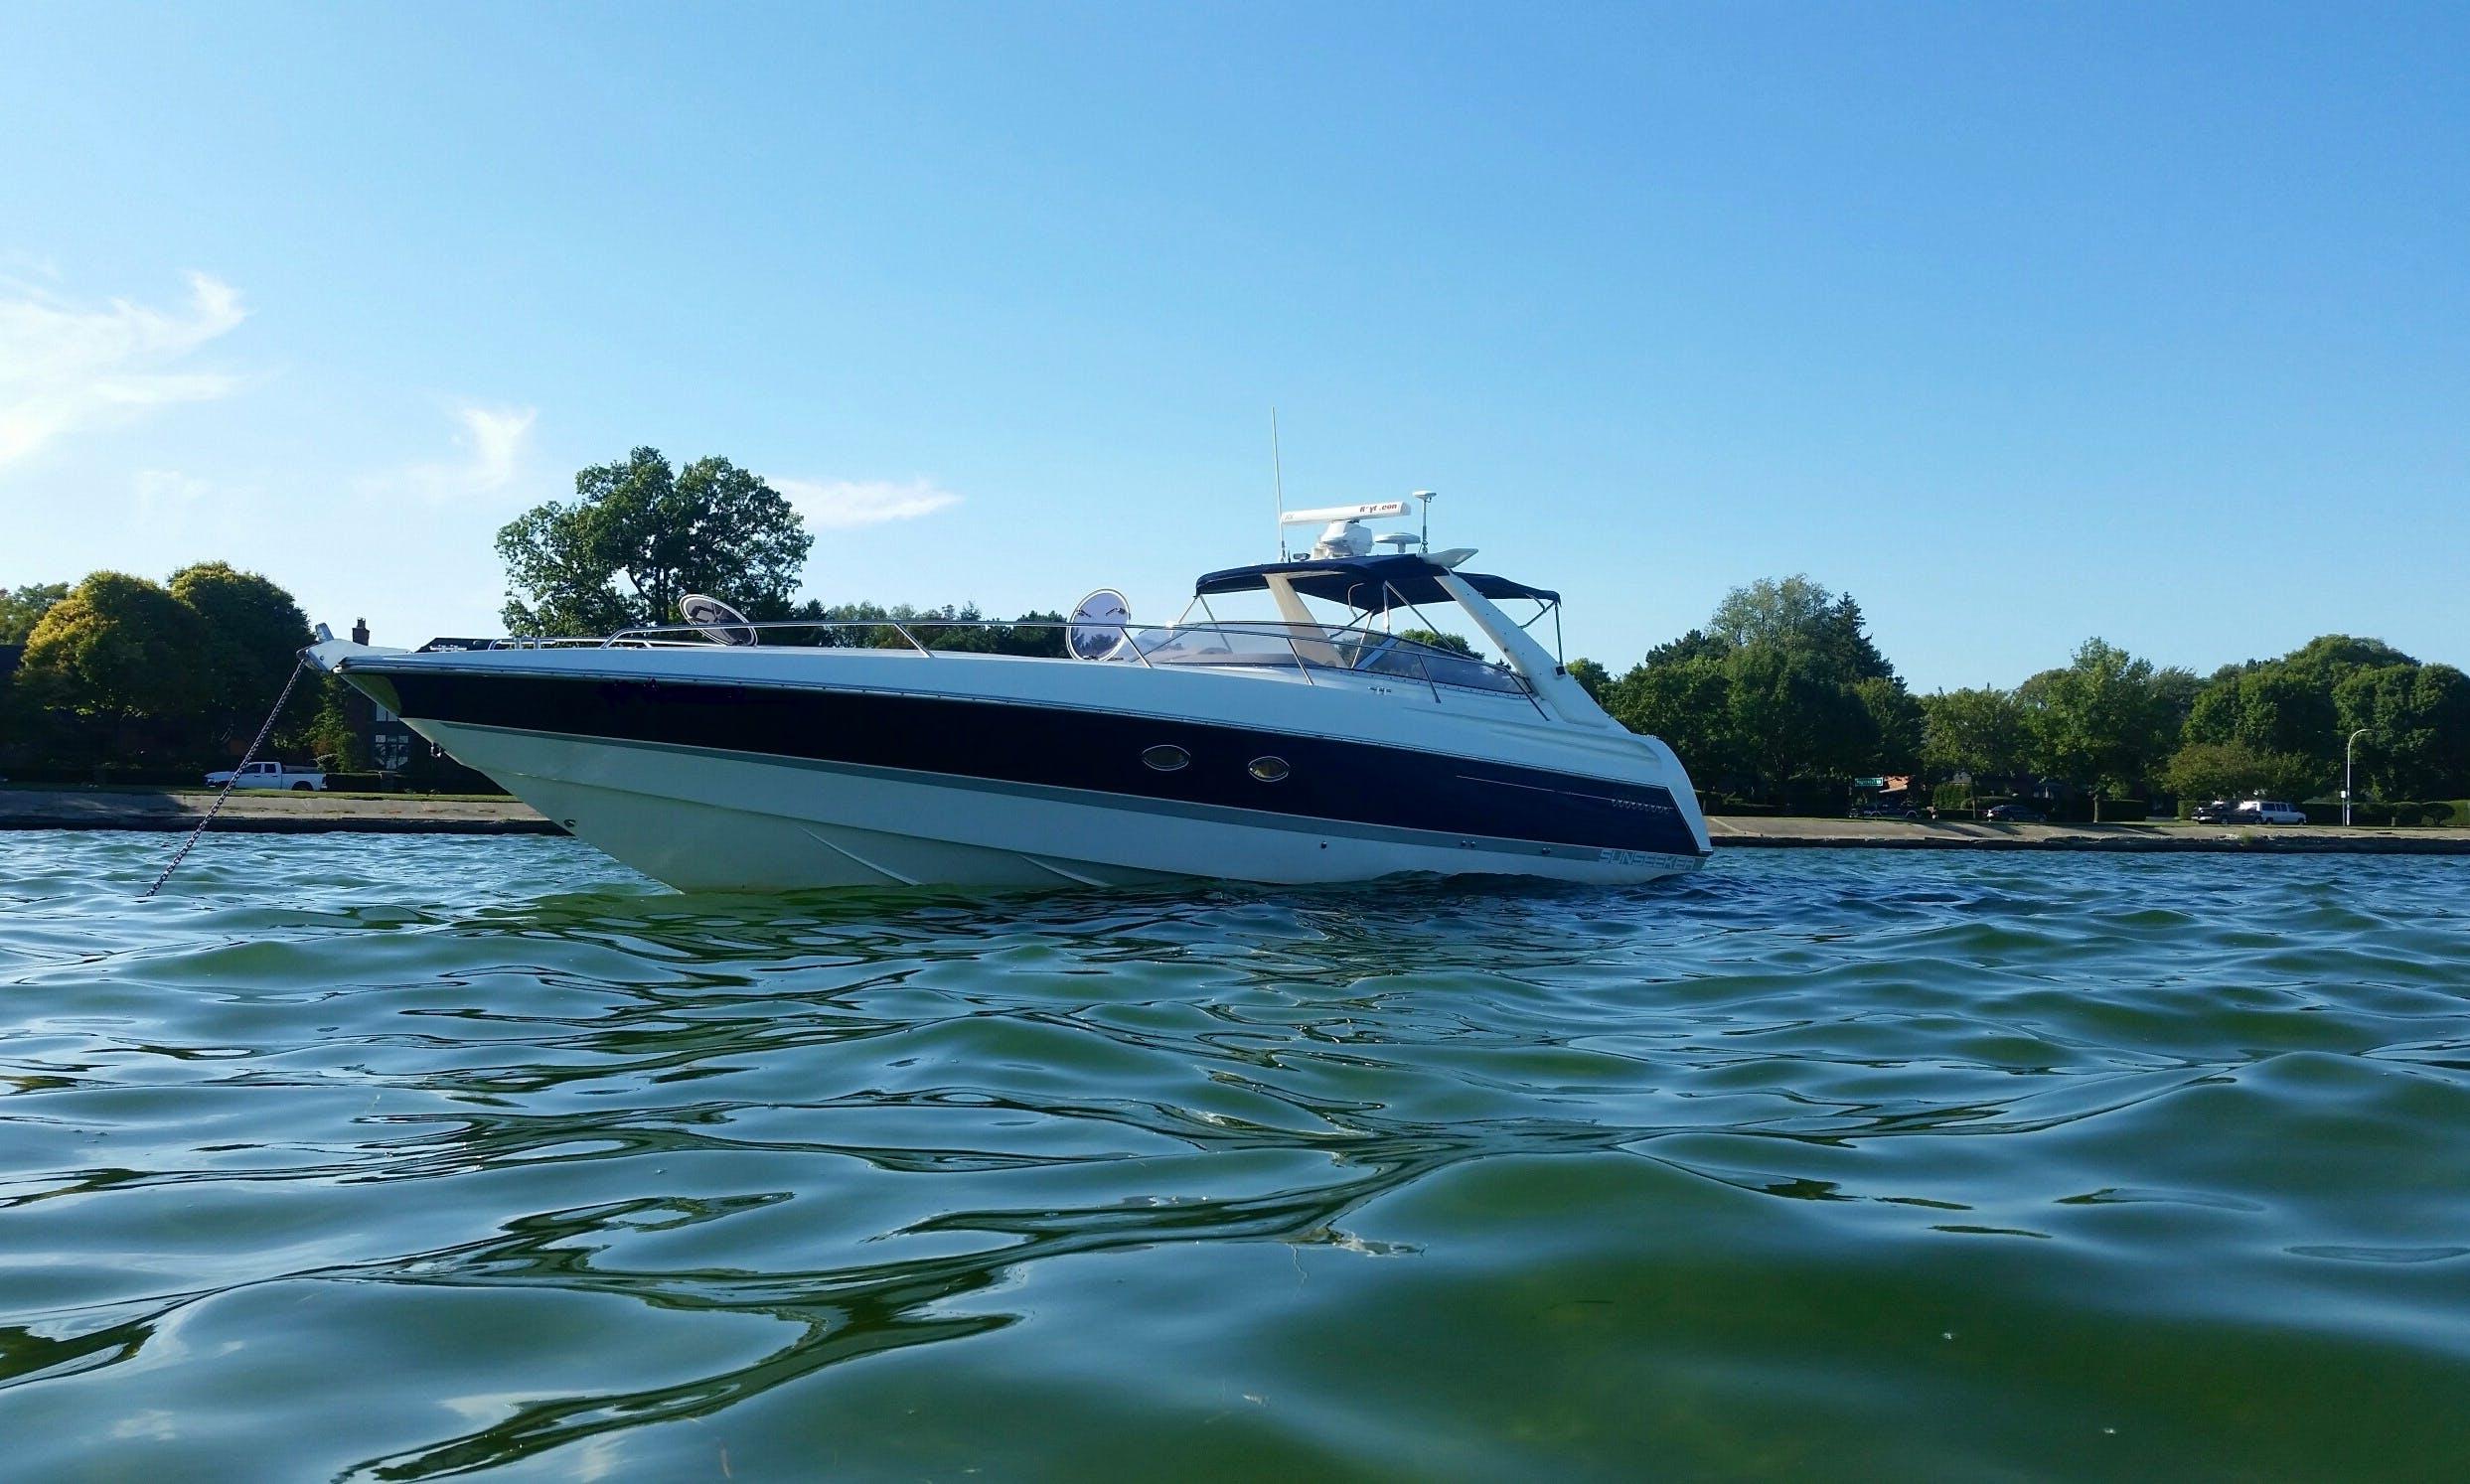 Motor Yacht Rental in Saint Clair Shores, Michigan